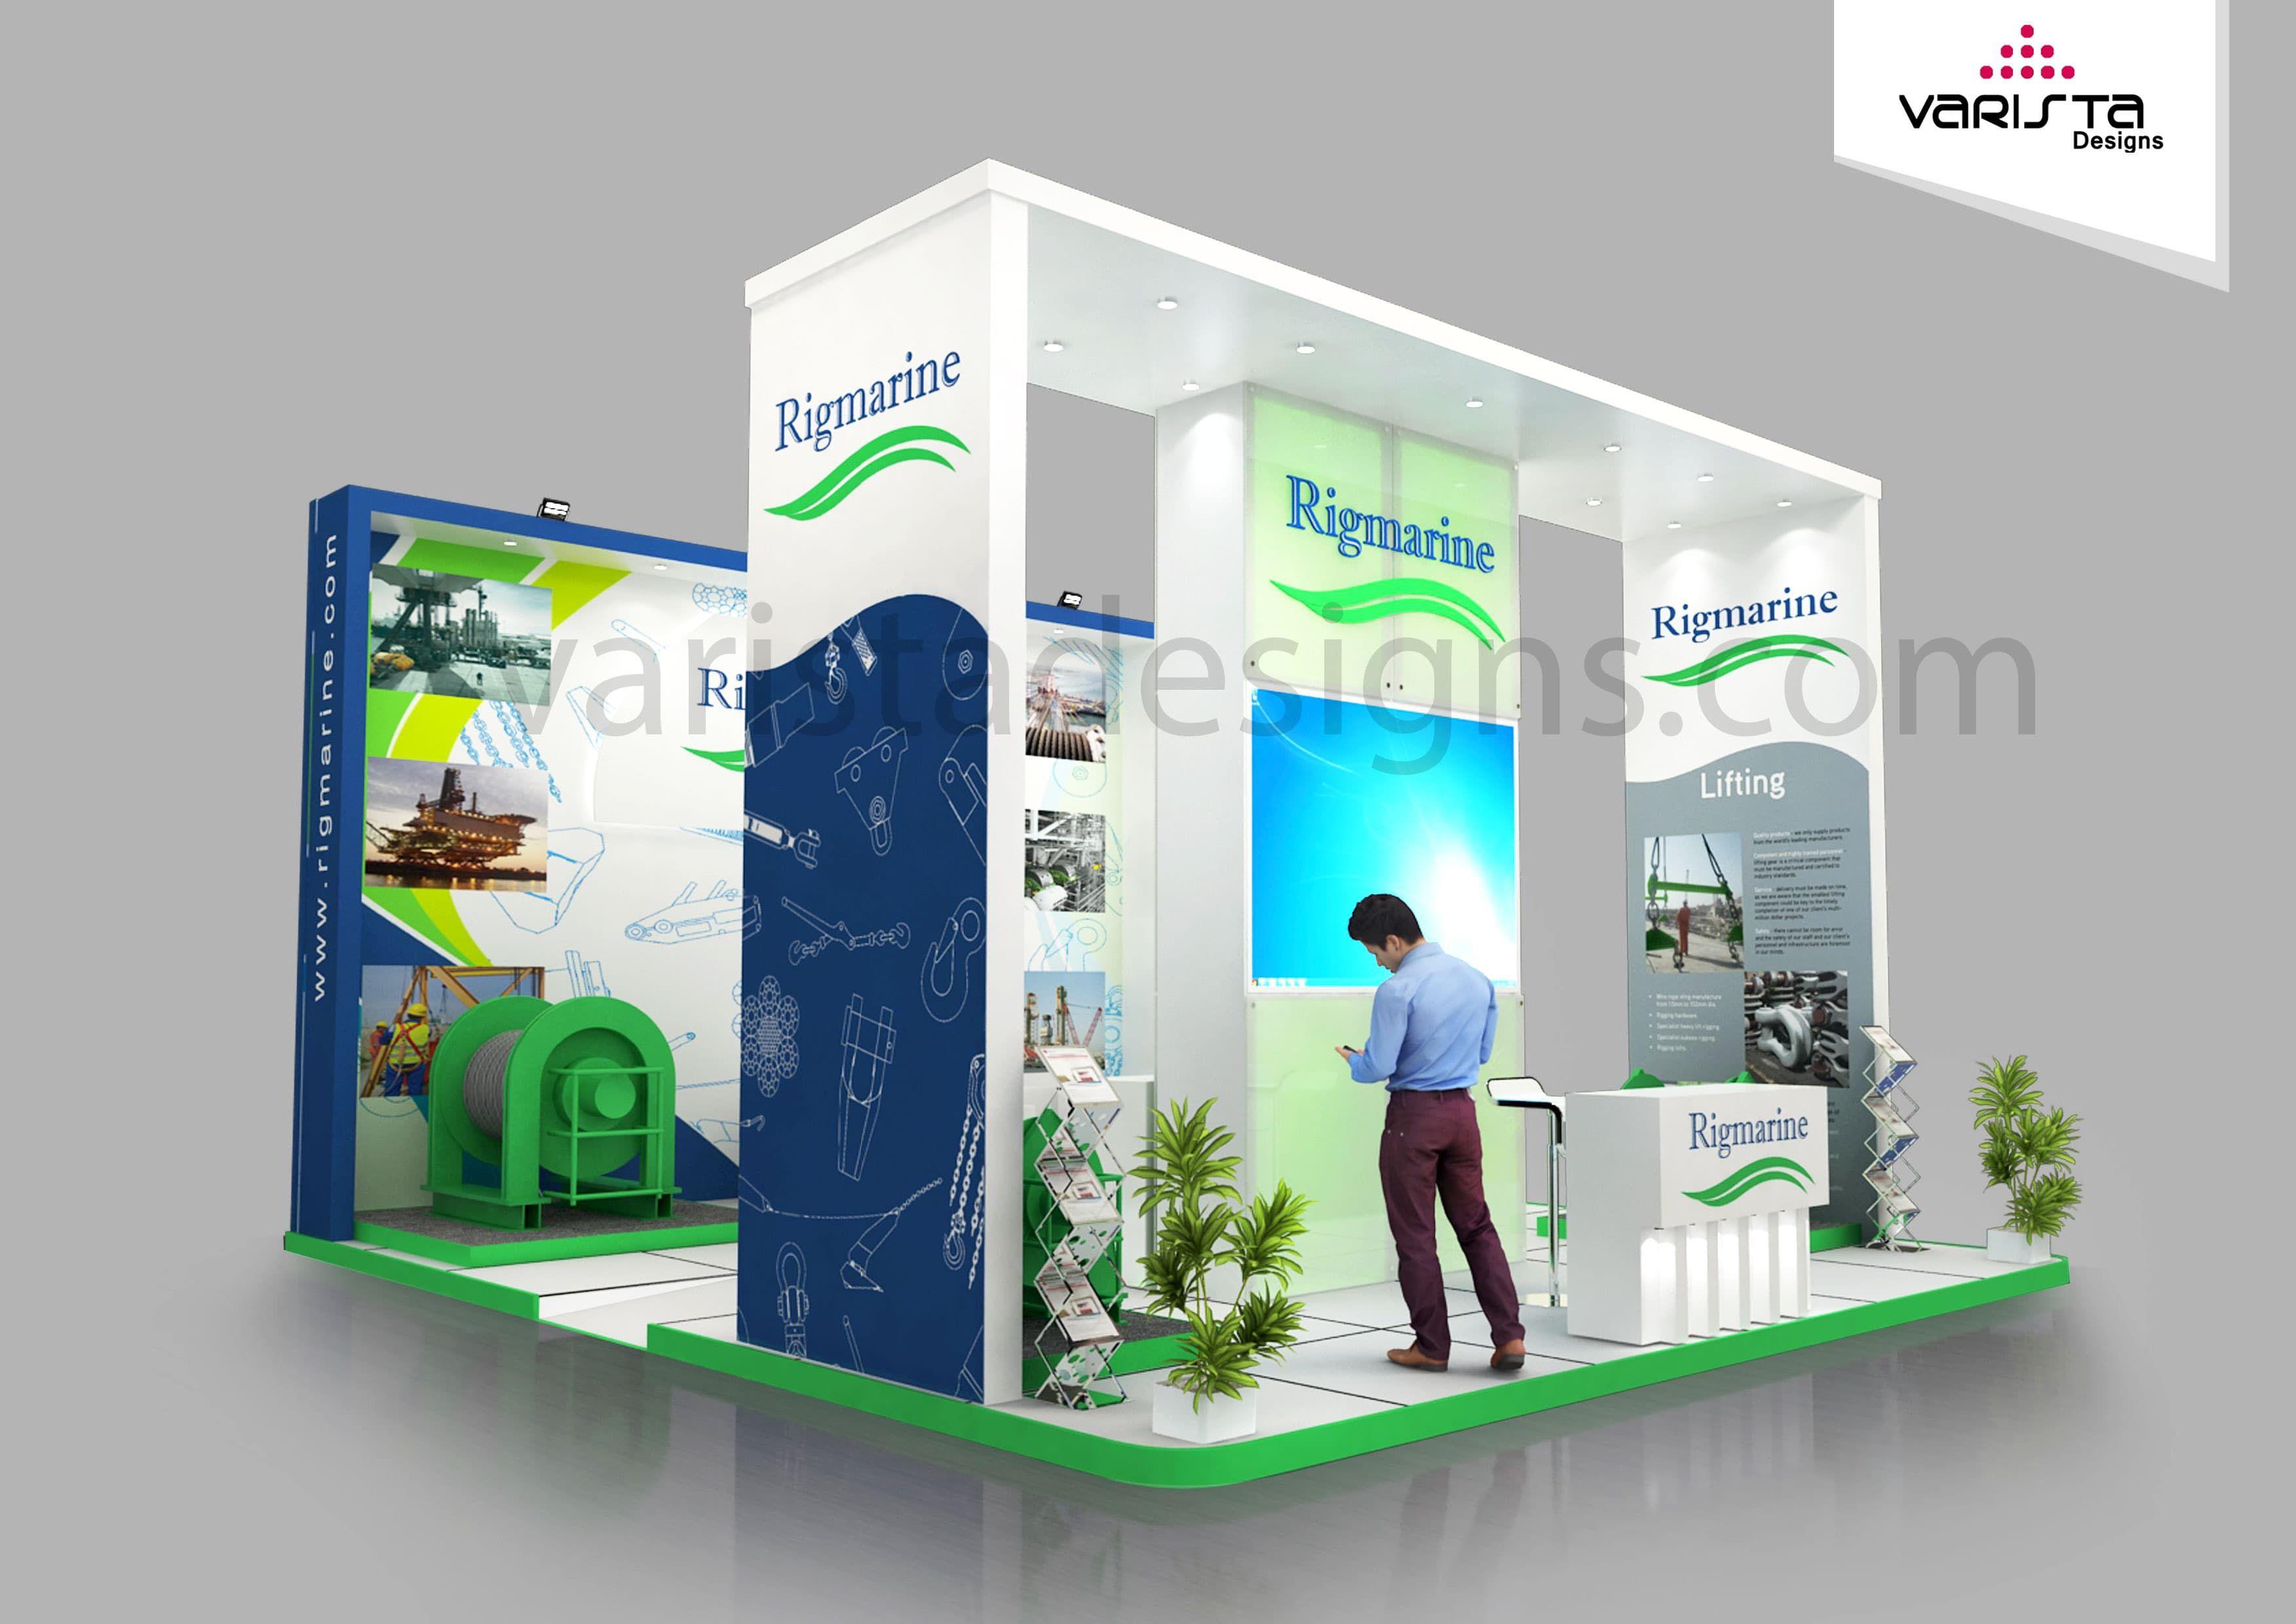 Exhibition Stand Proposal : Exhibition stand design proposal for rigmarine adnec exhibit